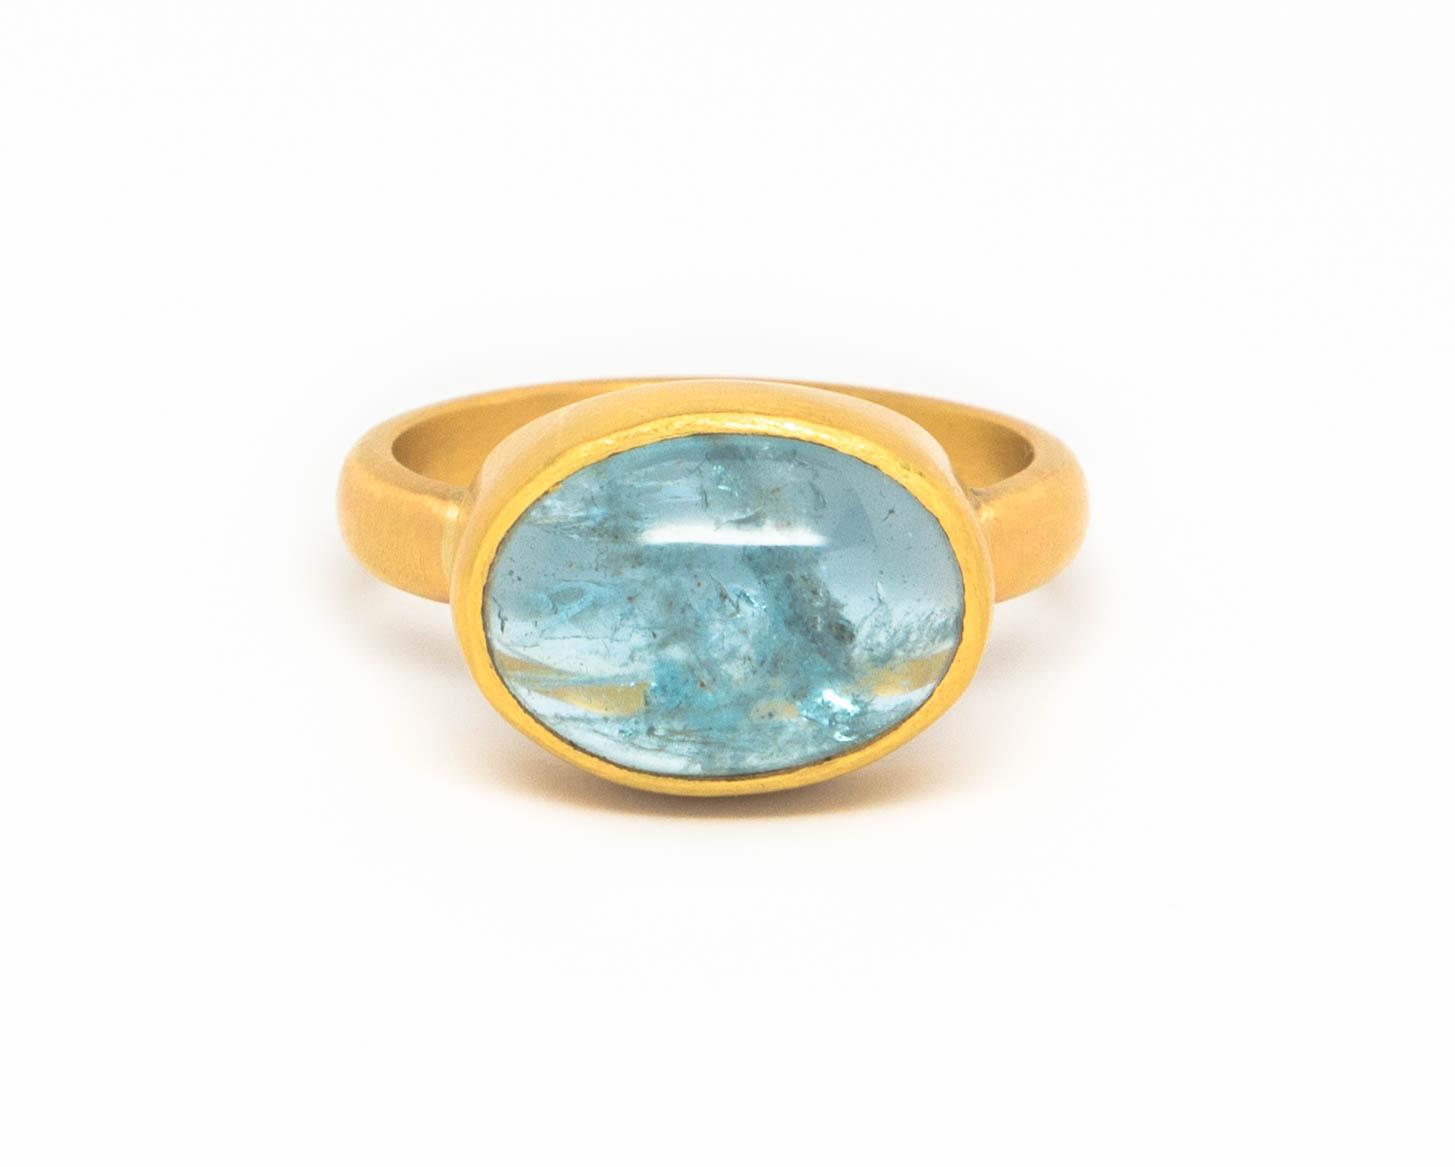 dec21 jewelry5-613.jpg